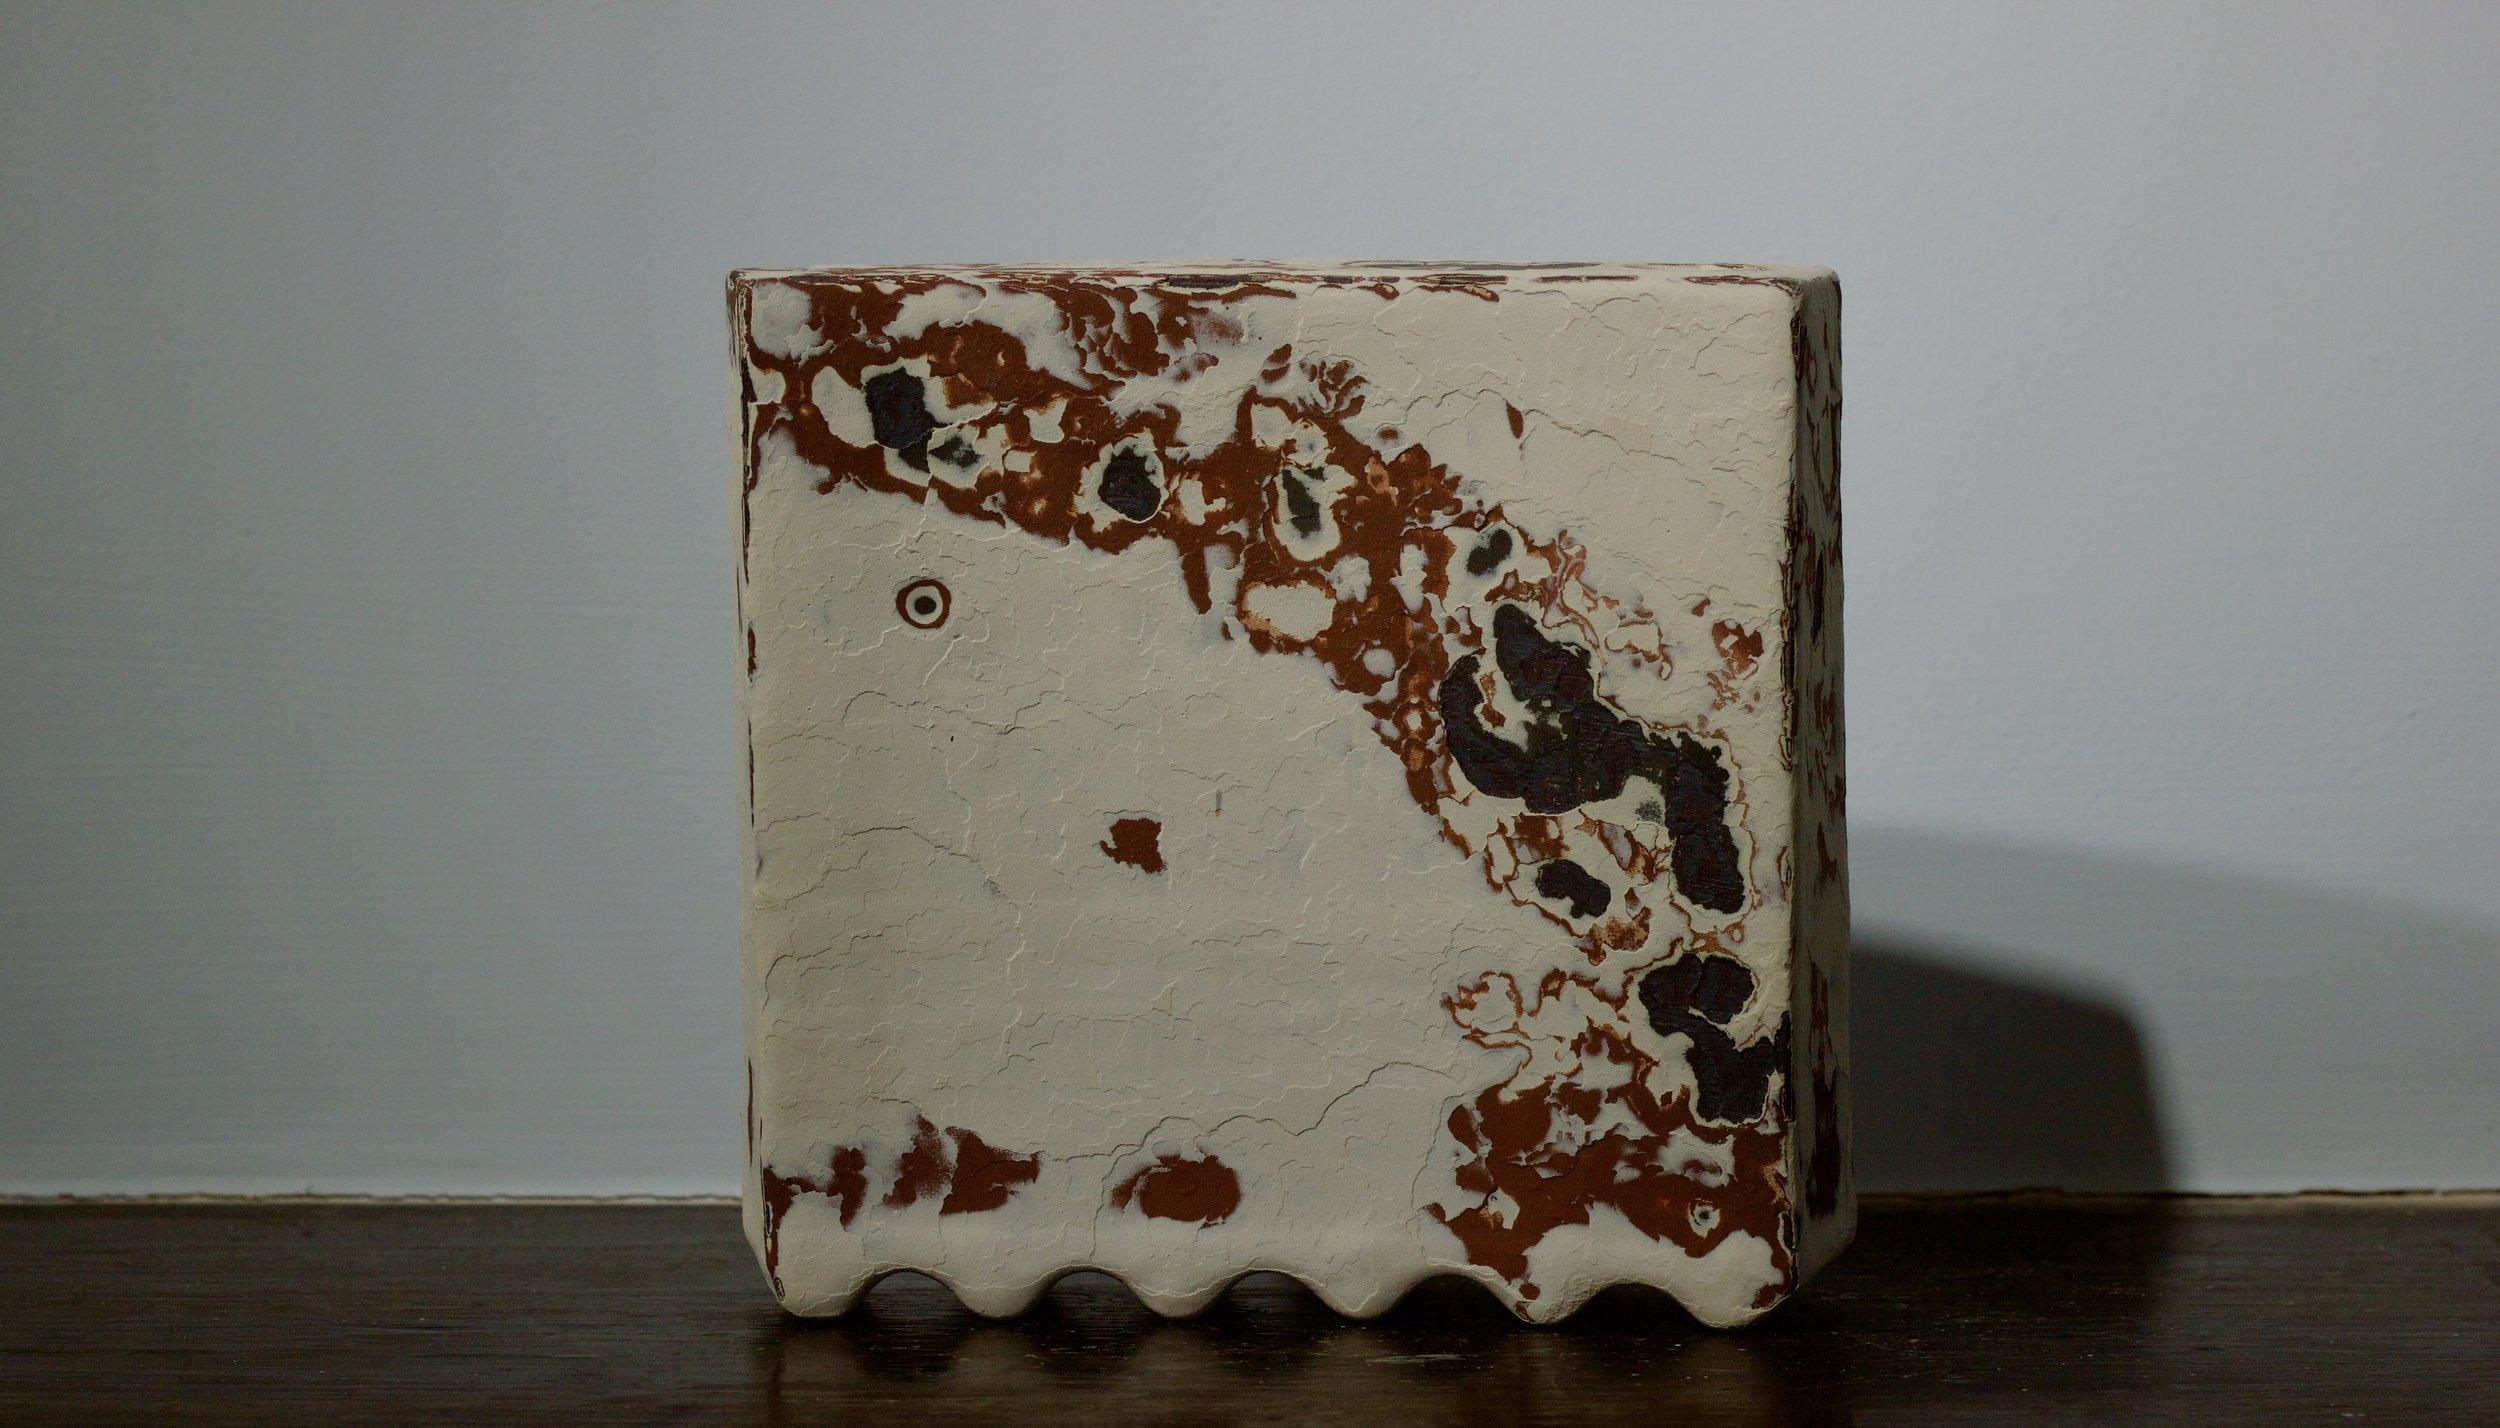 Jame Faulkner - Small Rectangular Forms